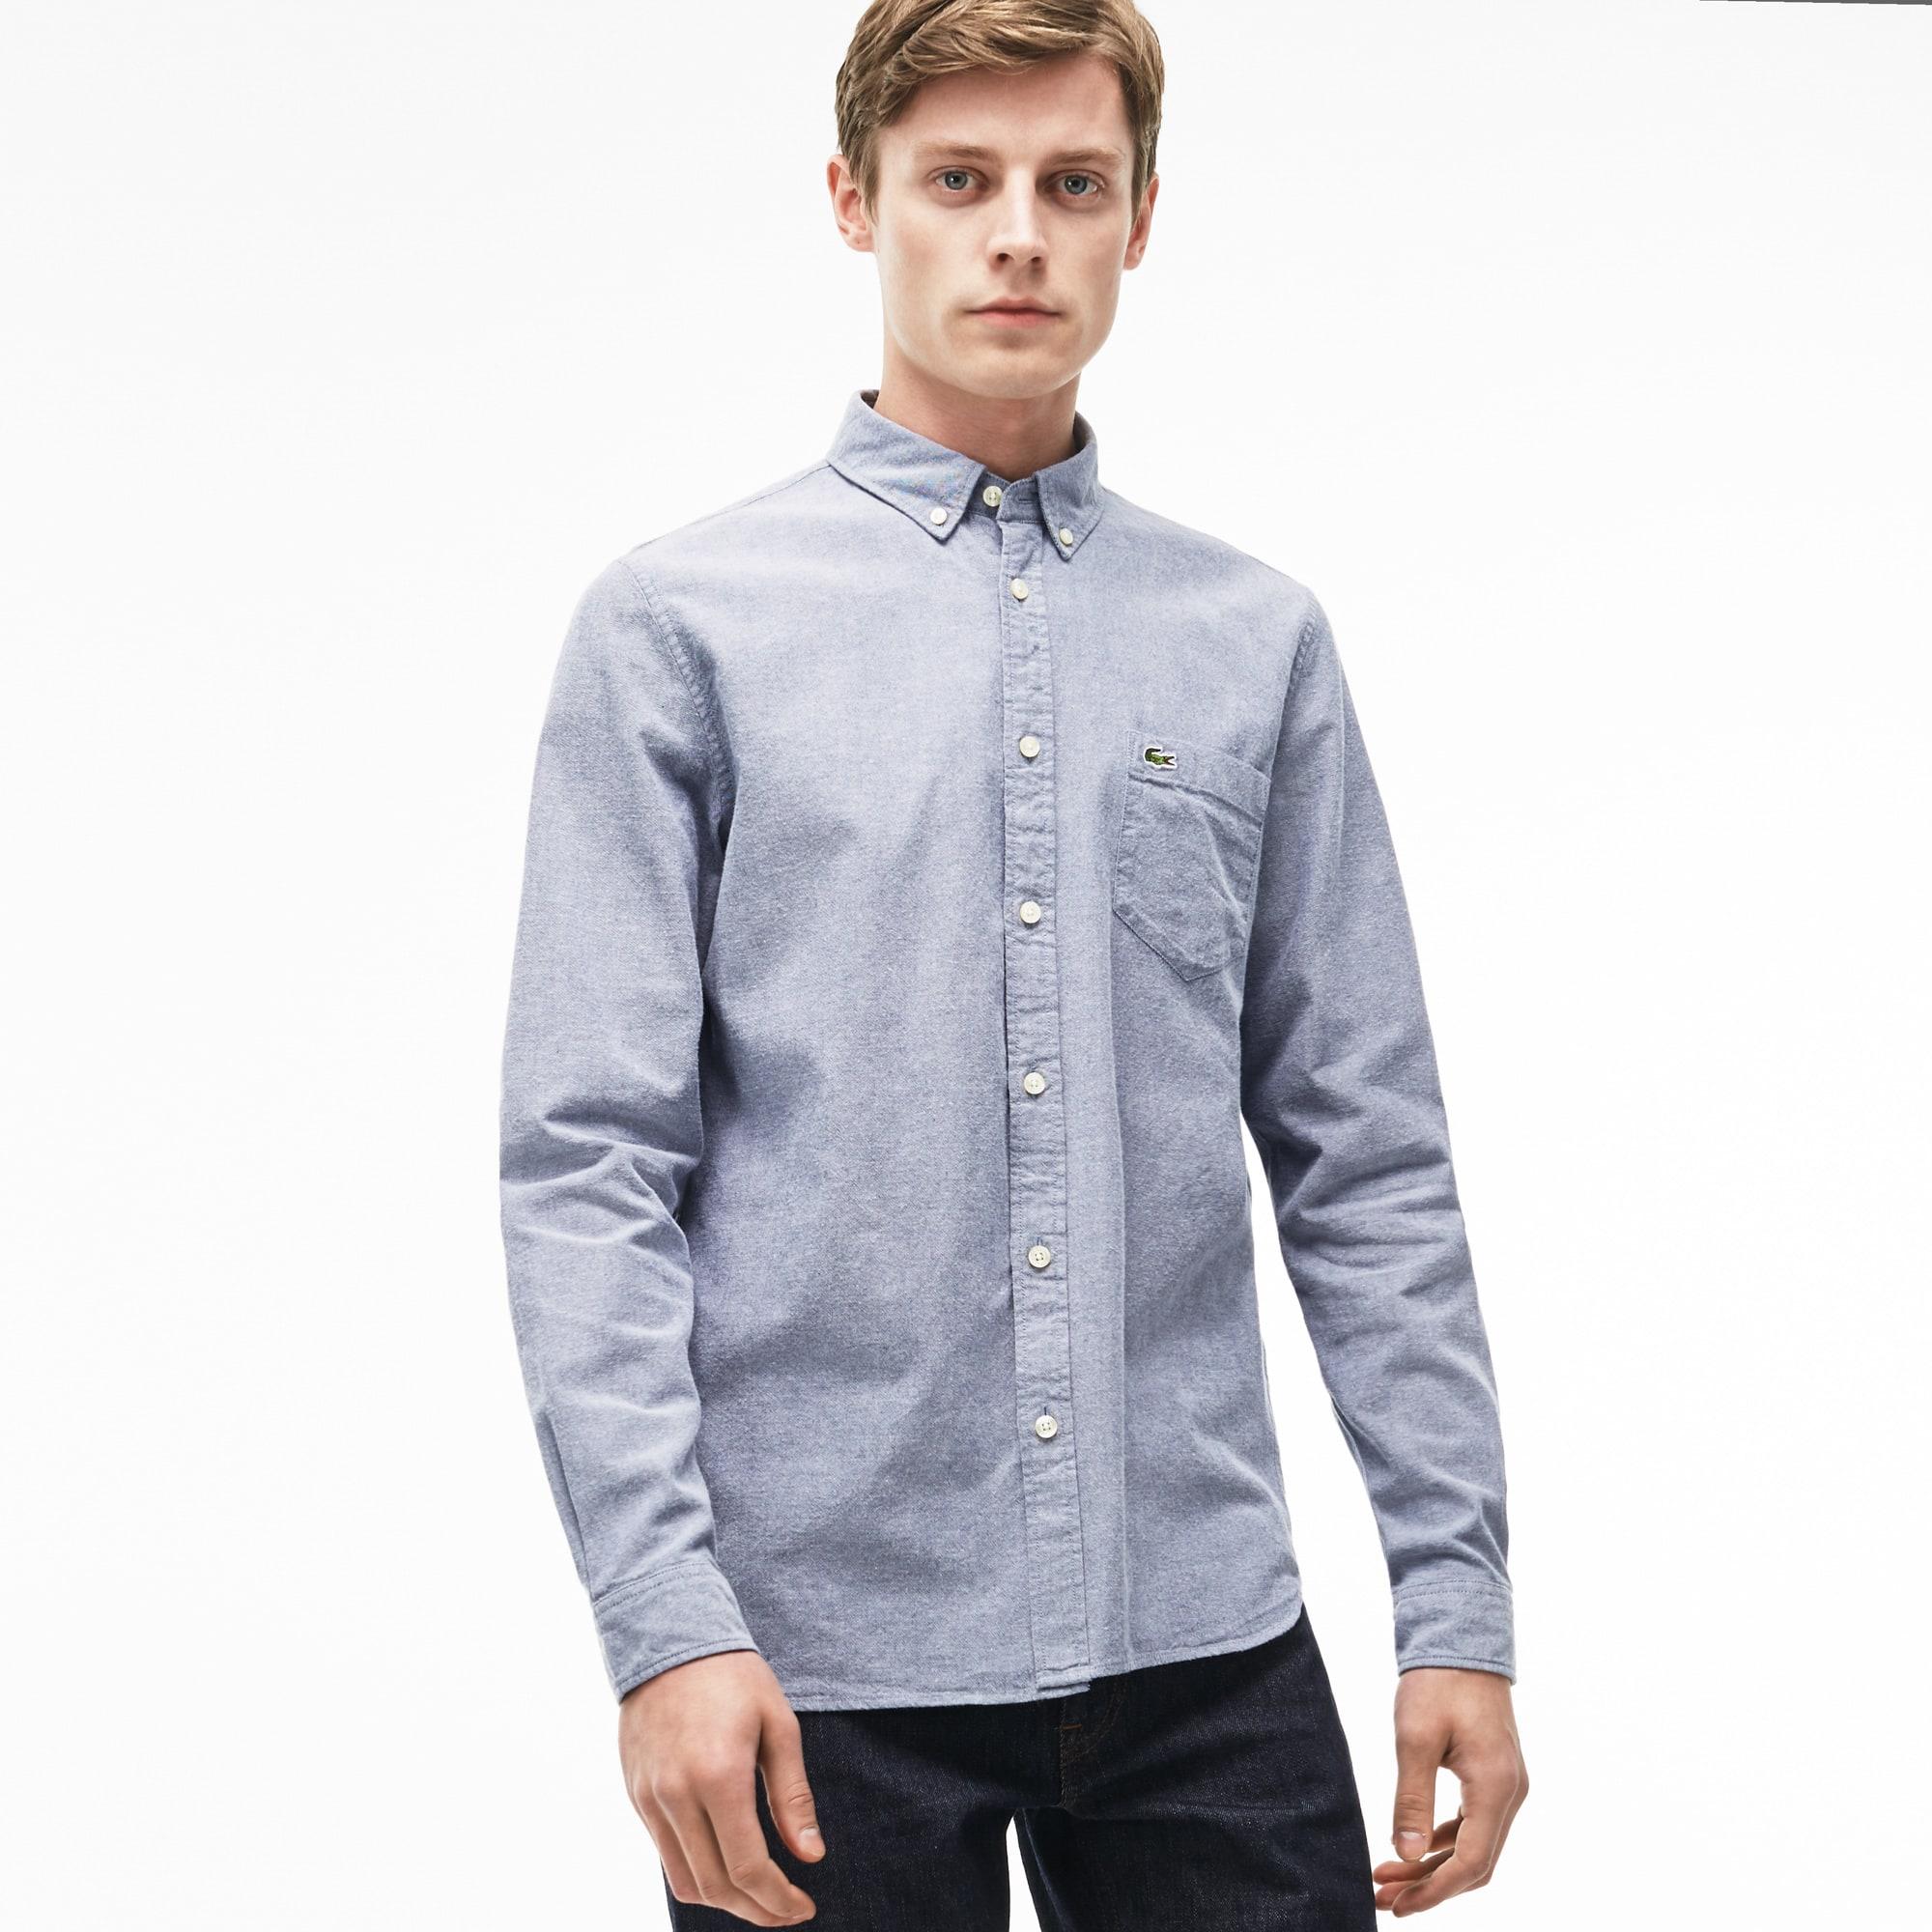 Lacoste Mens Regular Fit Oxford Cotton Shirt